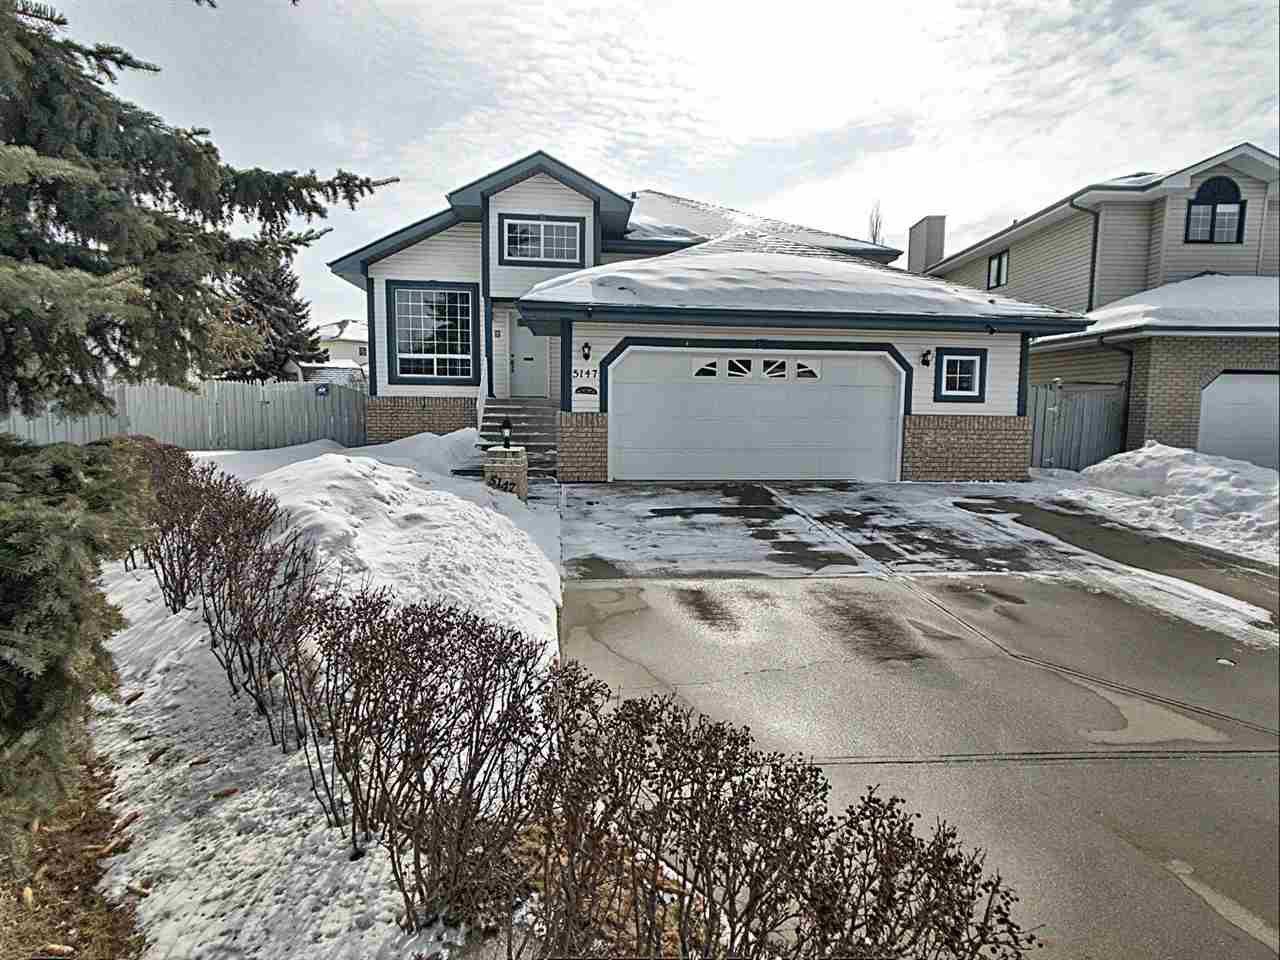 Main Photo: 5147 189 Street in Edmonton: Zone 20 House for sale : MLS®# E4192391